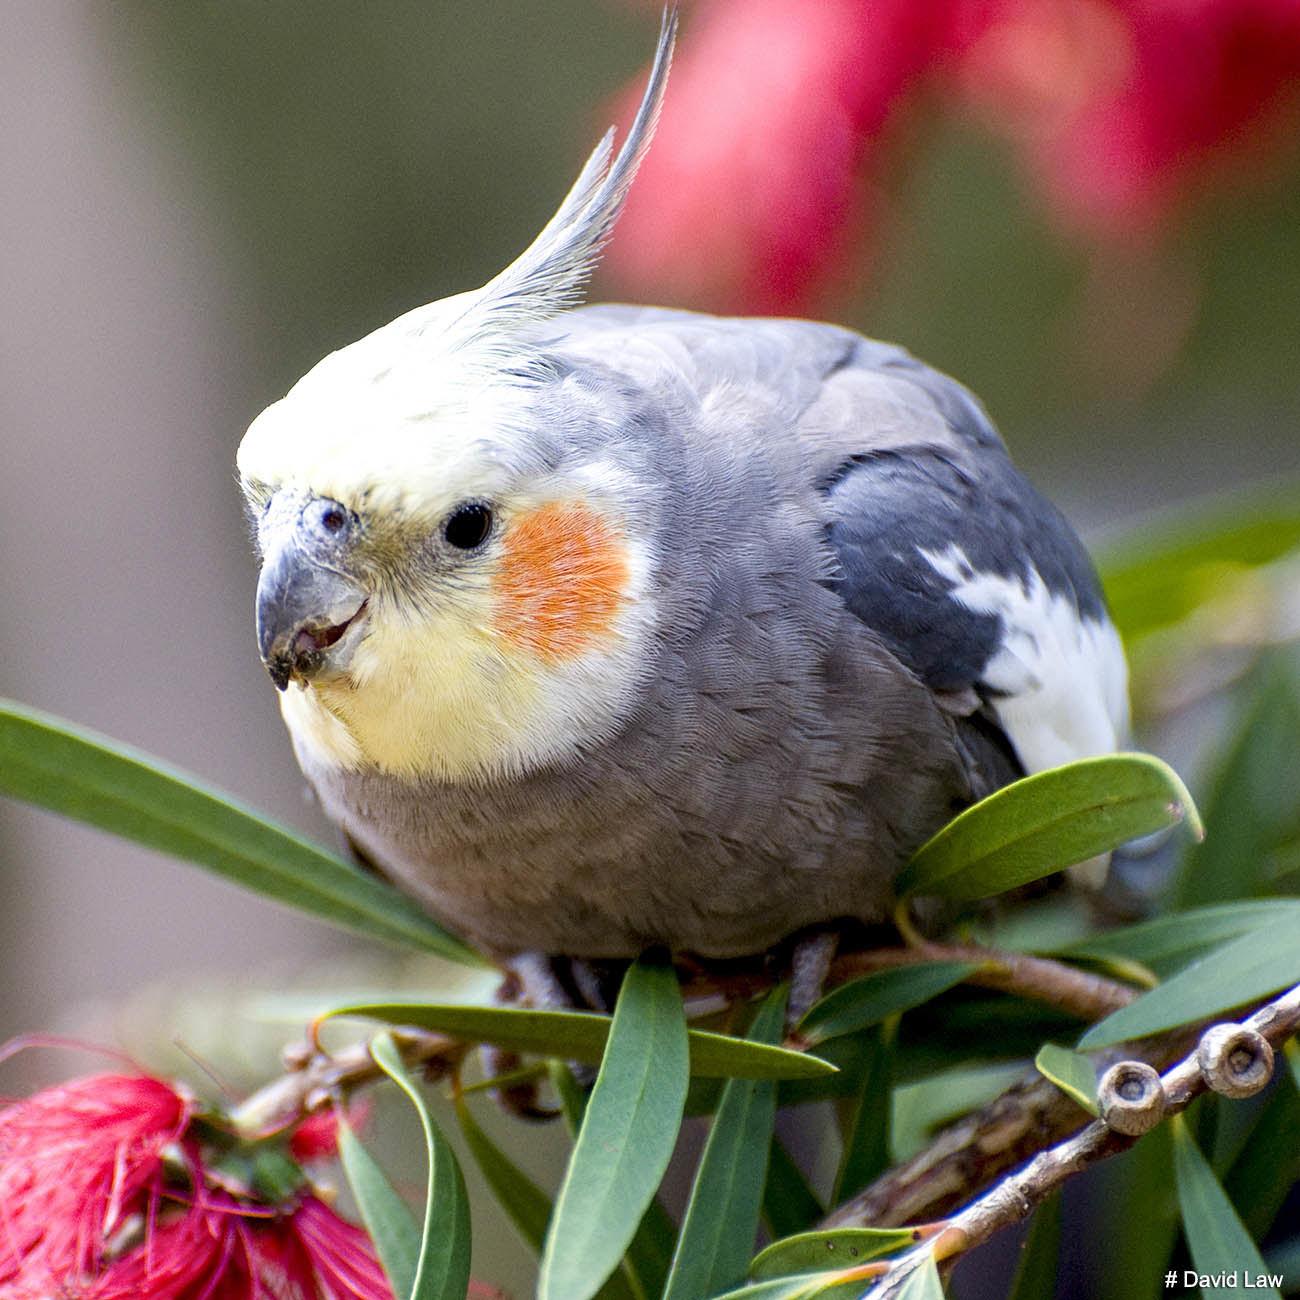 Bird 9 Square wns s0220